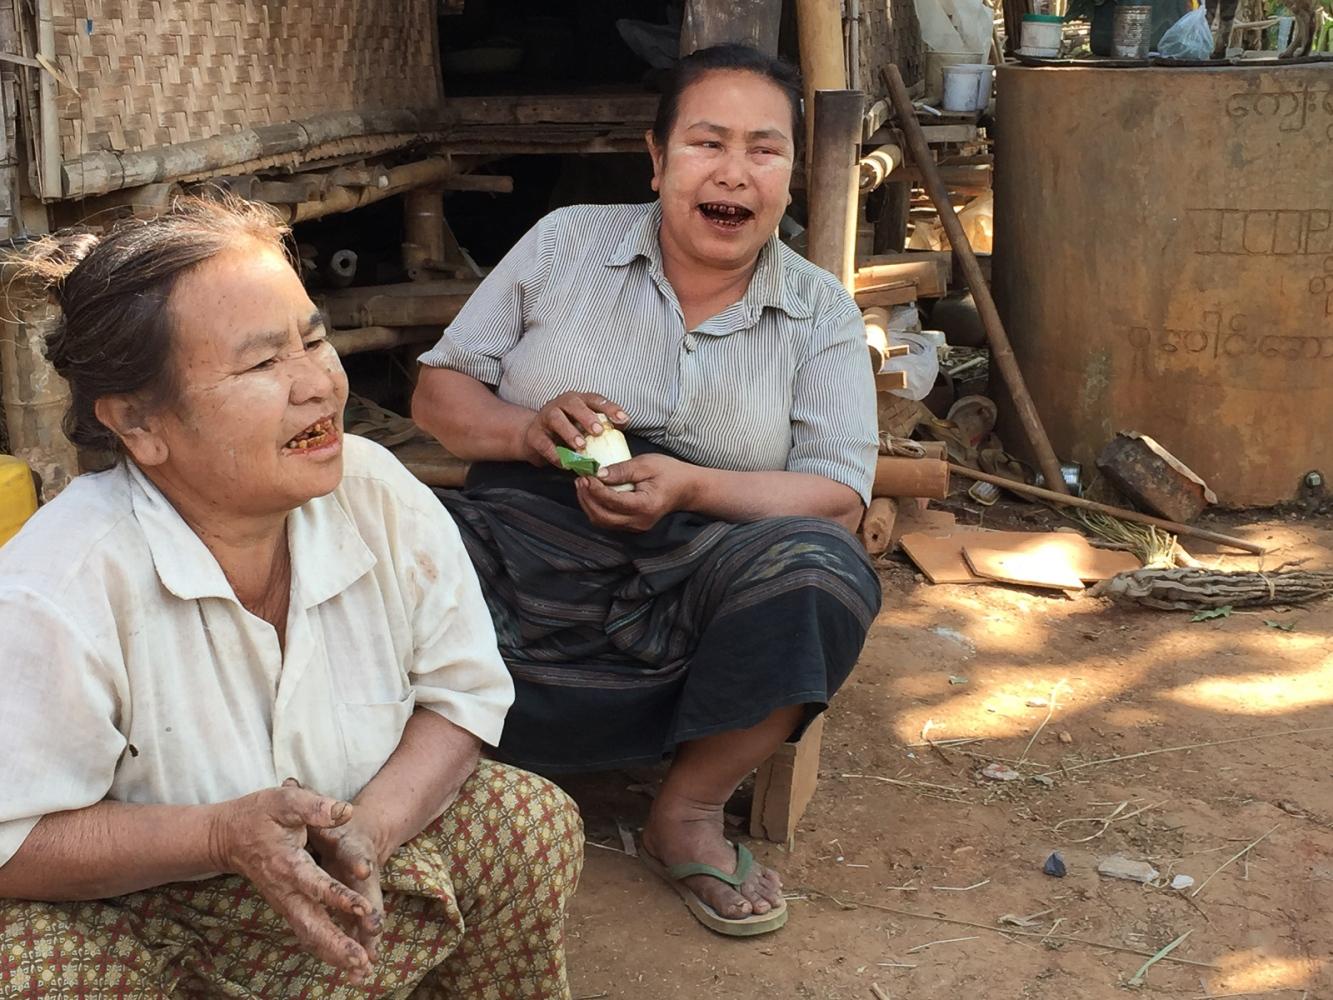 Art and Documentary Photography - Loading 20150213_Burma_2015_0180.jpg